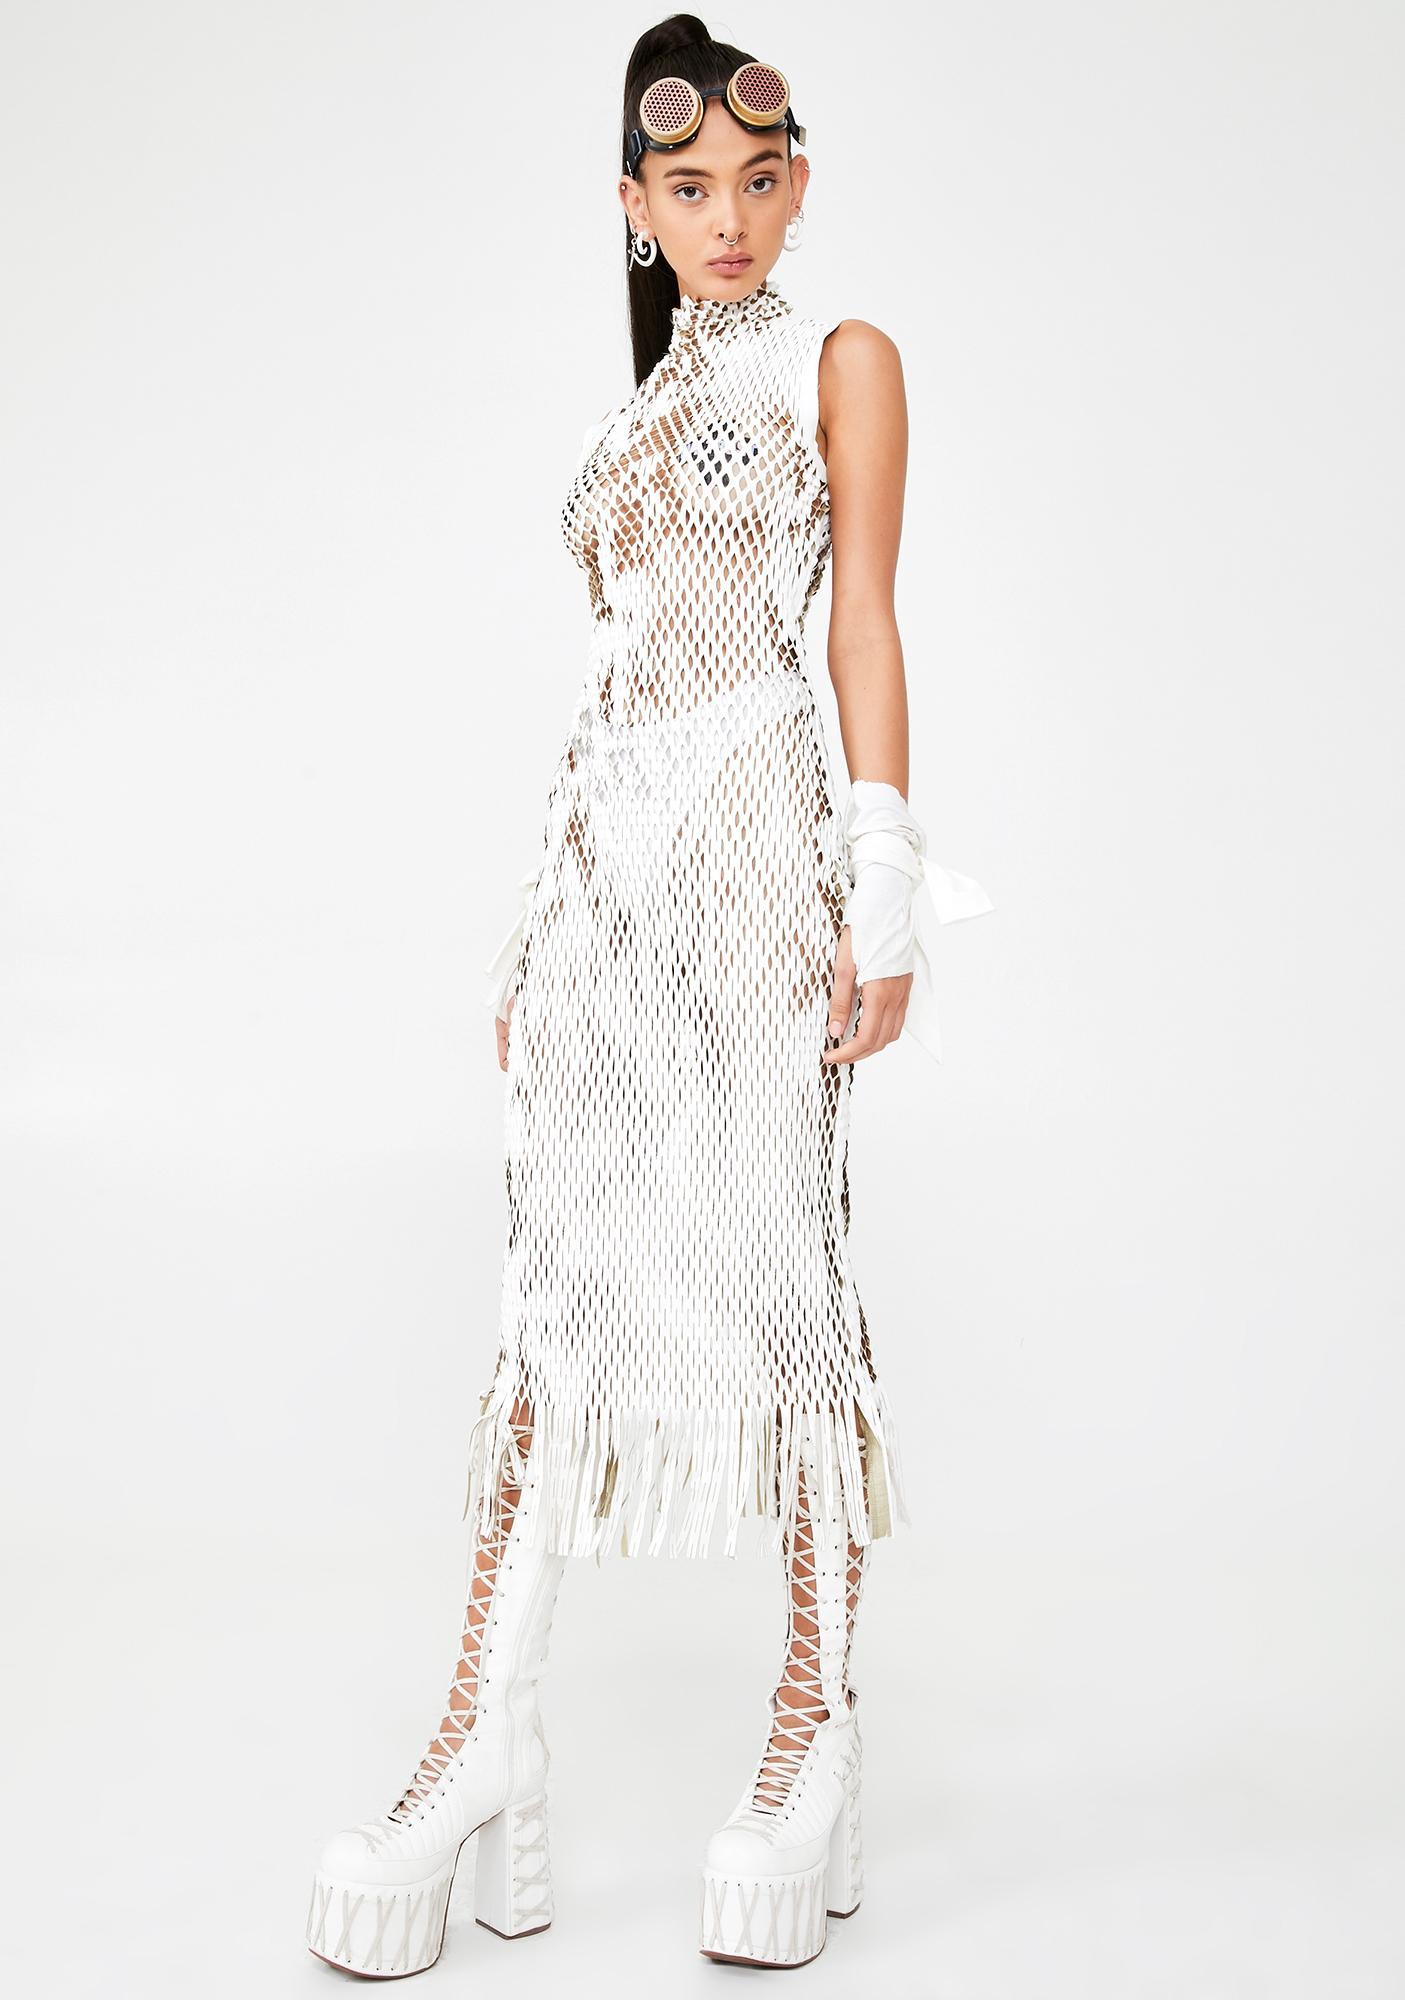 Kiki Riki Dysphoria Dream Fishnet Dress